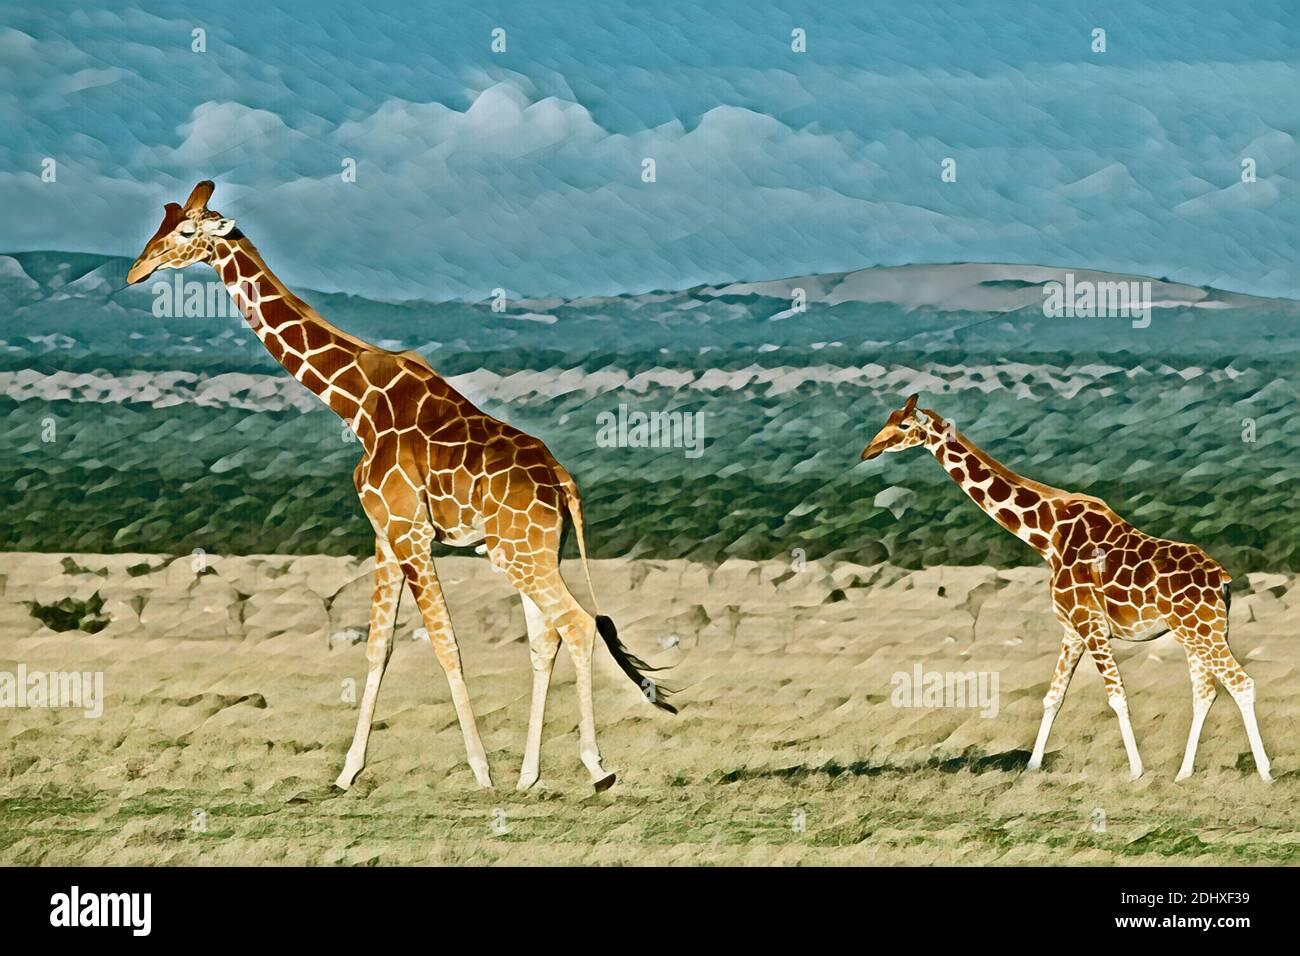 África, Kenia, Meseta de Laikipia, Distrito fronterizo Norte, Ol Pejeta Conservancy. Jirafas reticuladas (SILVESTRE: Giraffa camelopardalis reticulata) COM Foto de stock